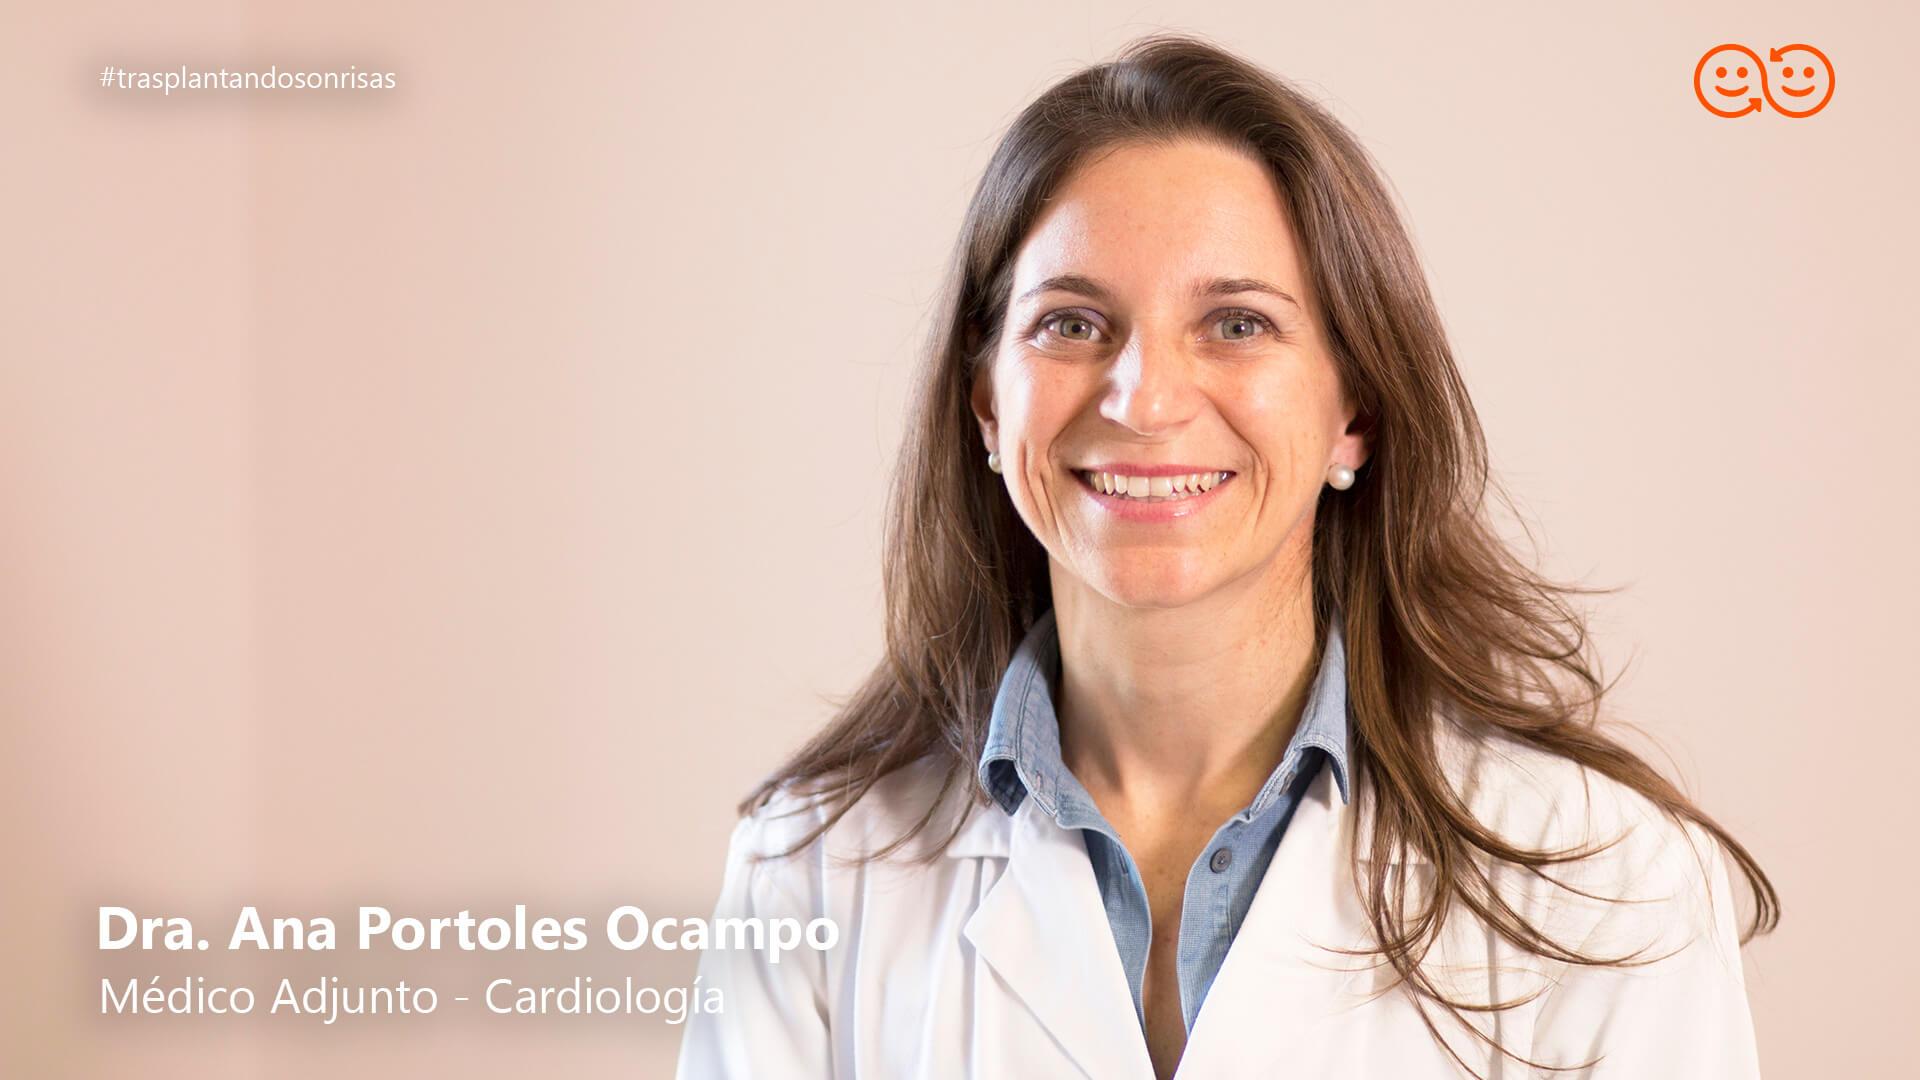 Dra. Ana Portoles Ocampo